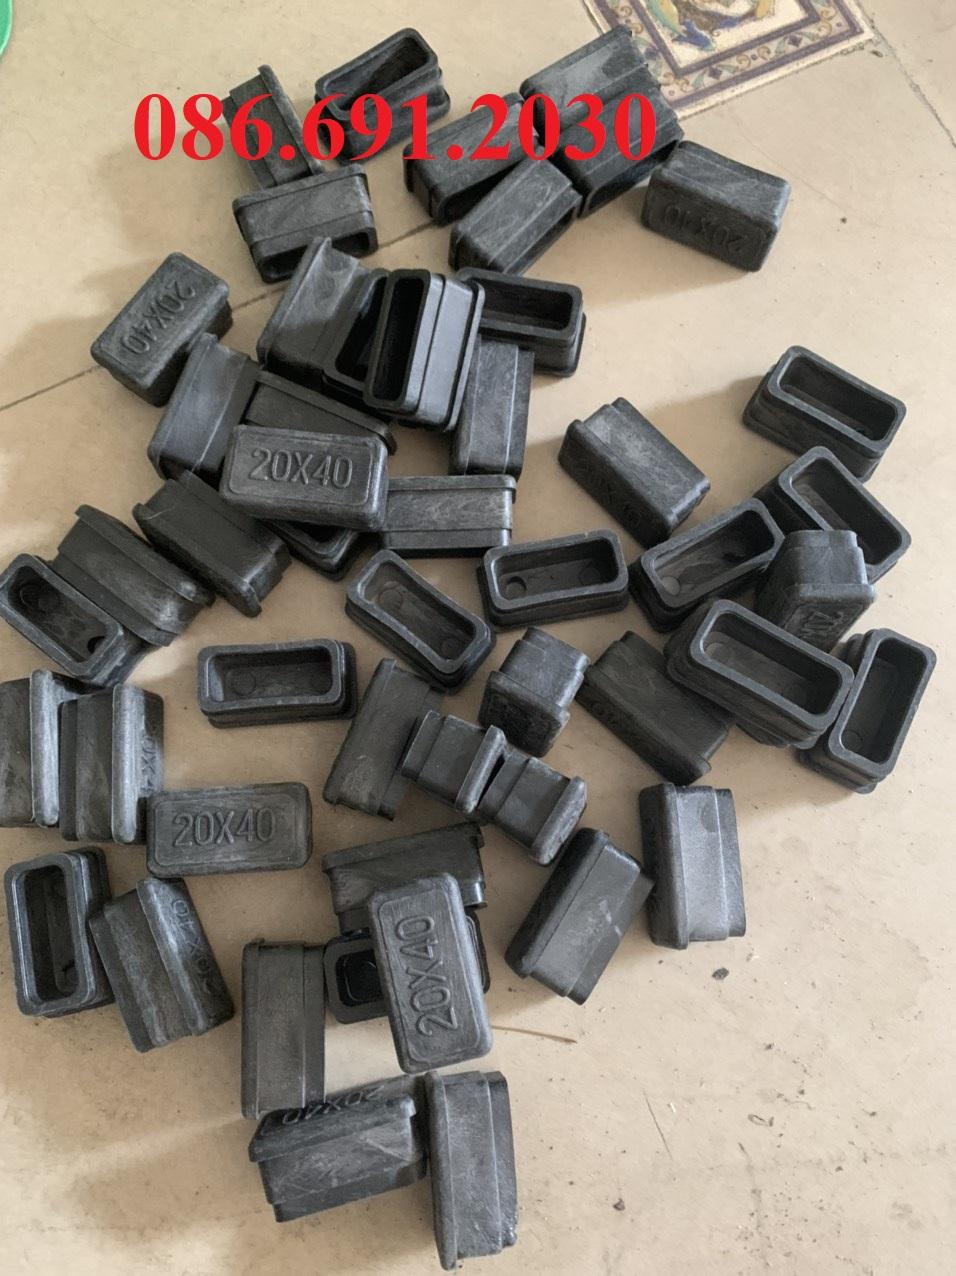 Nút cao su bịt lỗ, nút bịt sắt ống hộp 20x40